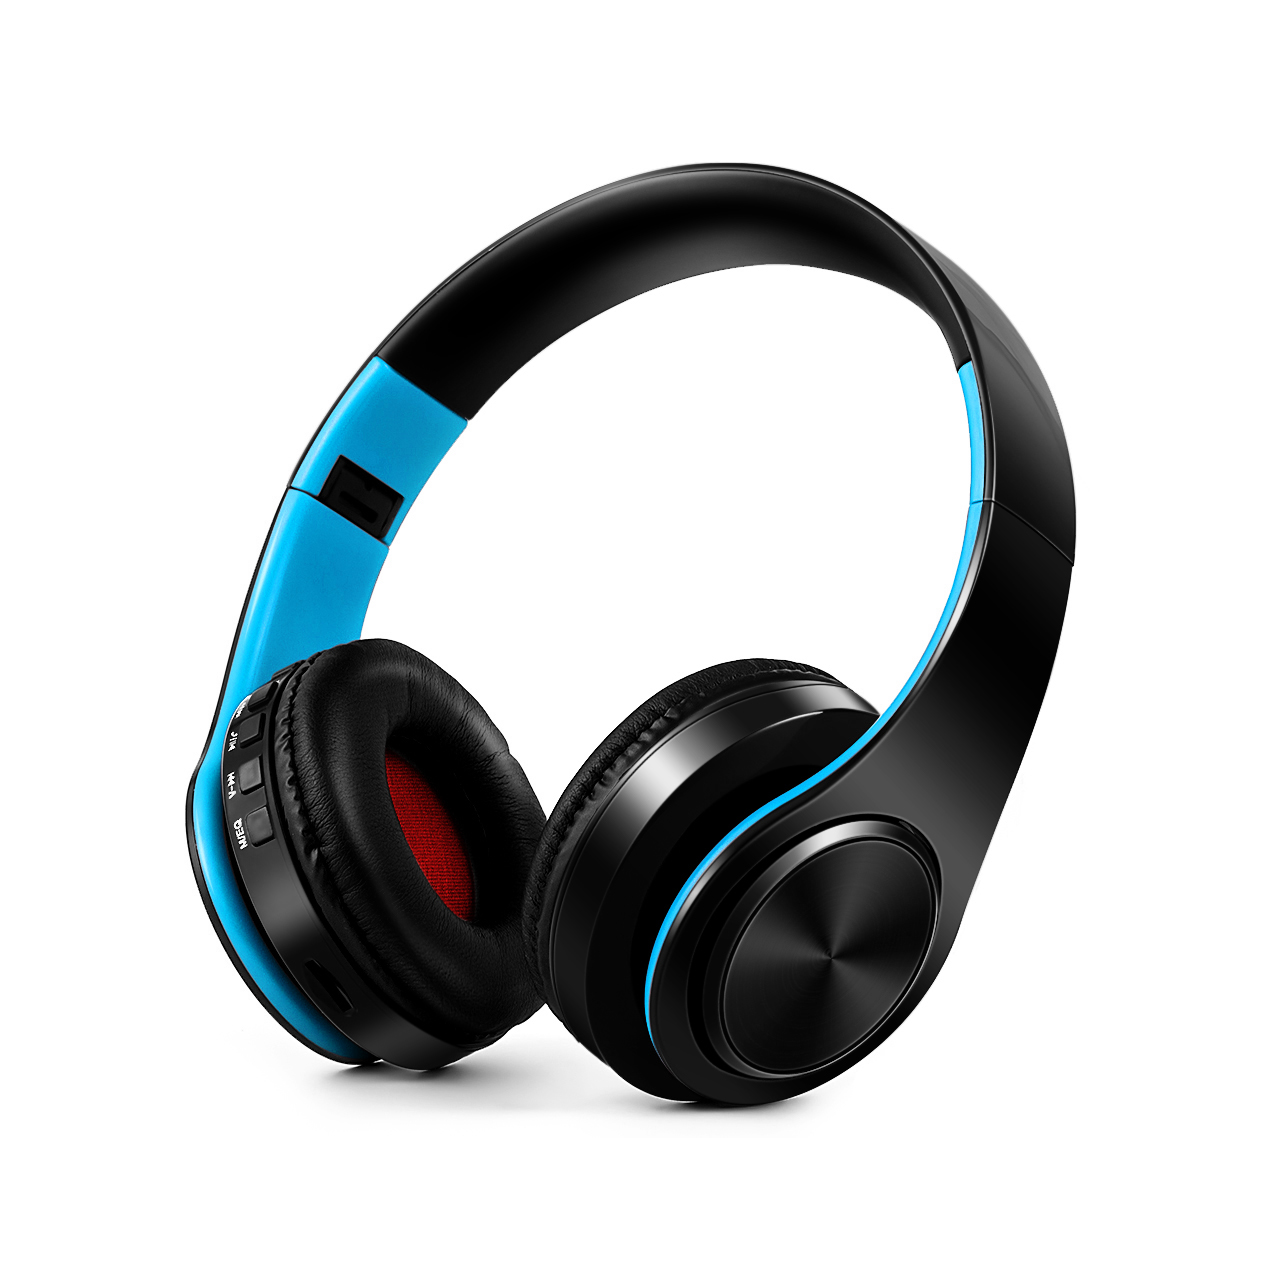 easyidea bluetooth earphones stereo foldable sport headphones wireless portable headset support. Black Bedroom Furniture Sets. Home Design Ideas